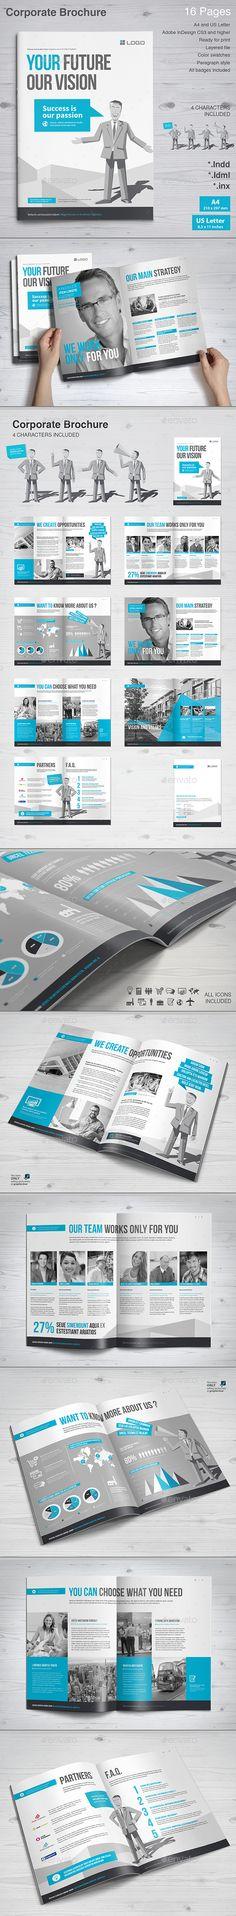 Car Wash TriFold Template  Car Wash Tri Fold And Brochures